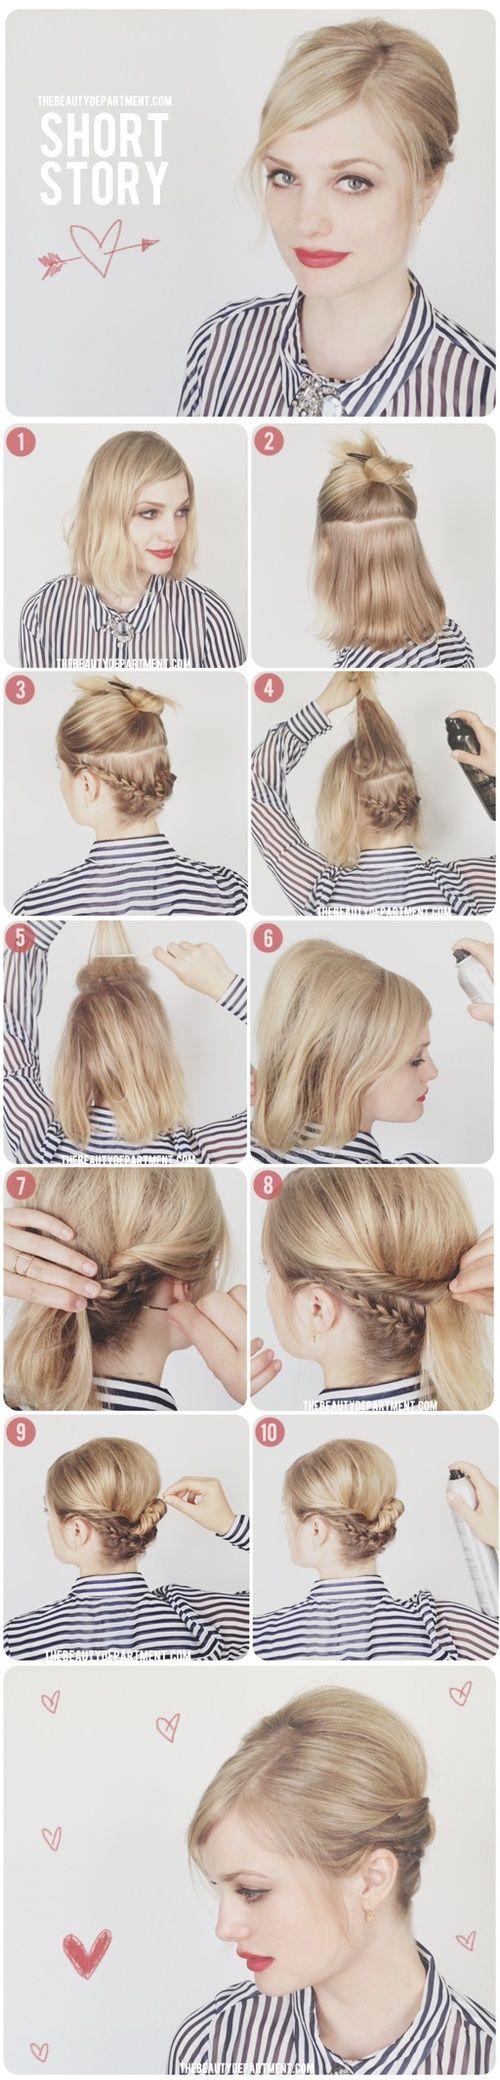 101 best Short Hair Tutorials images on Pinterest   Make up looks ...